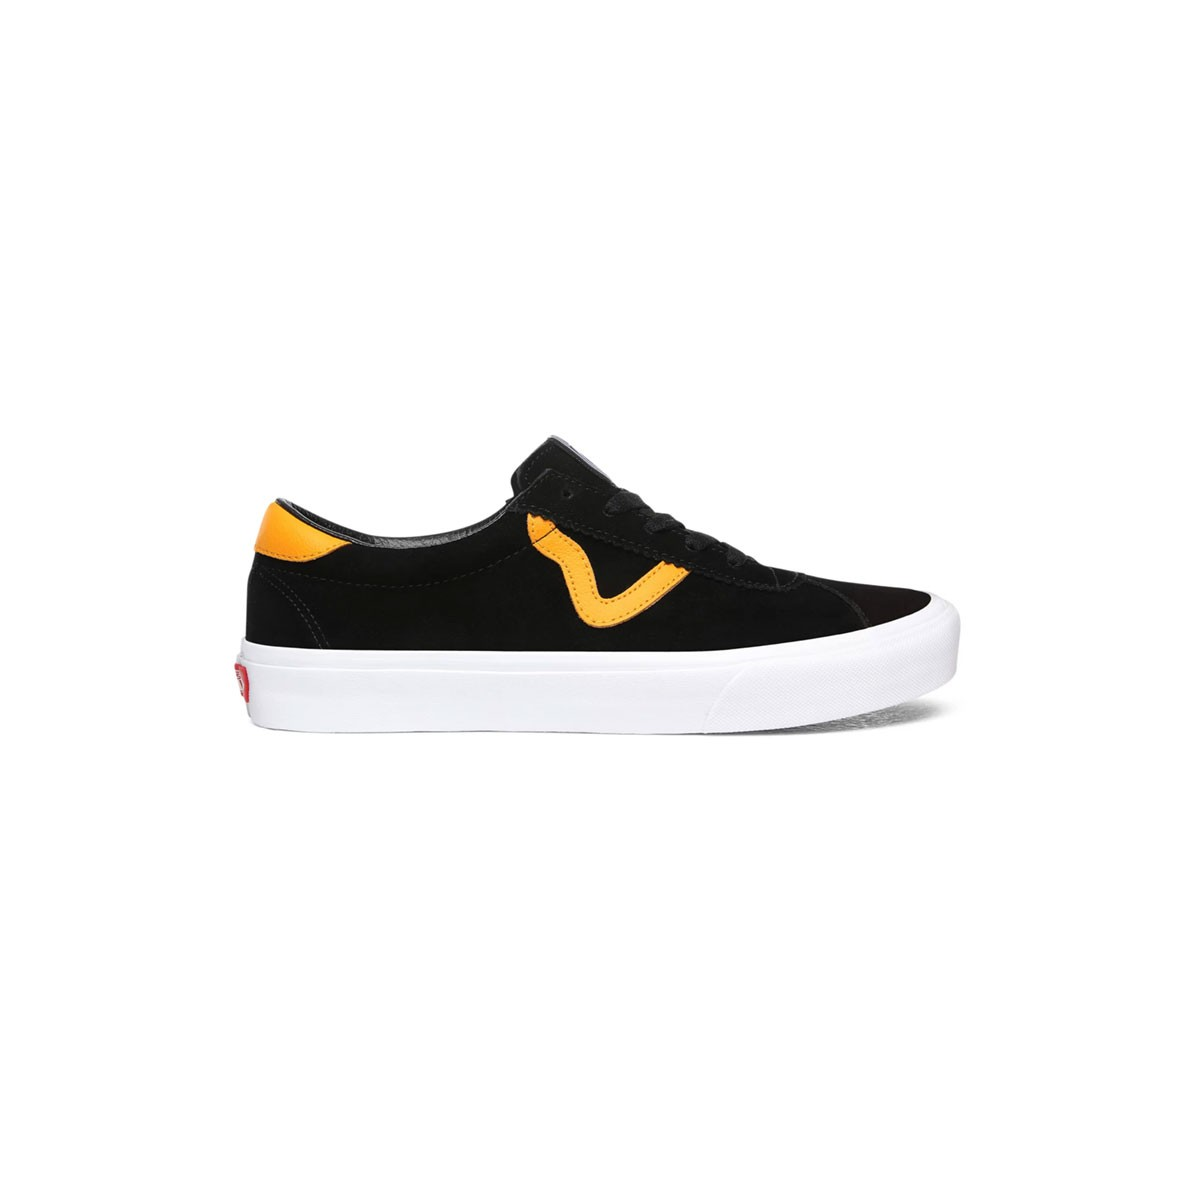 chaussures vans jaunes